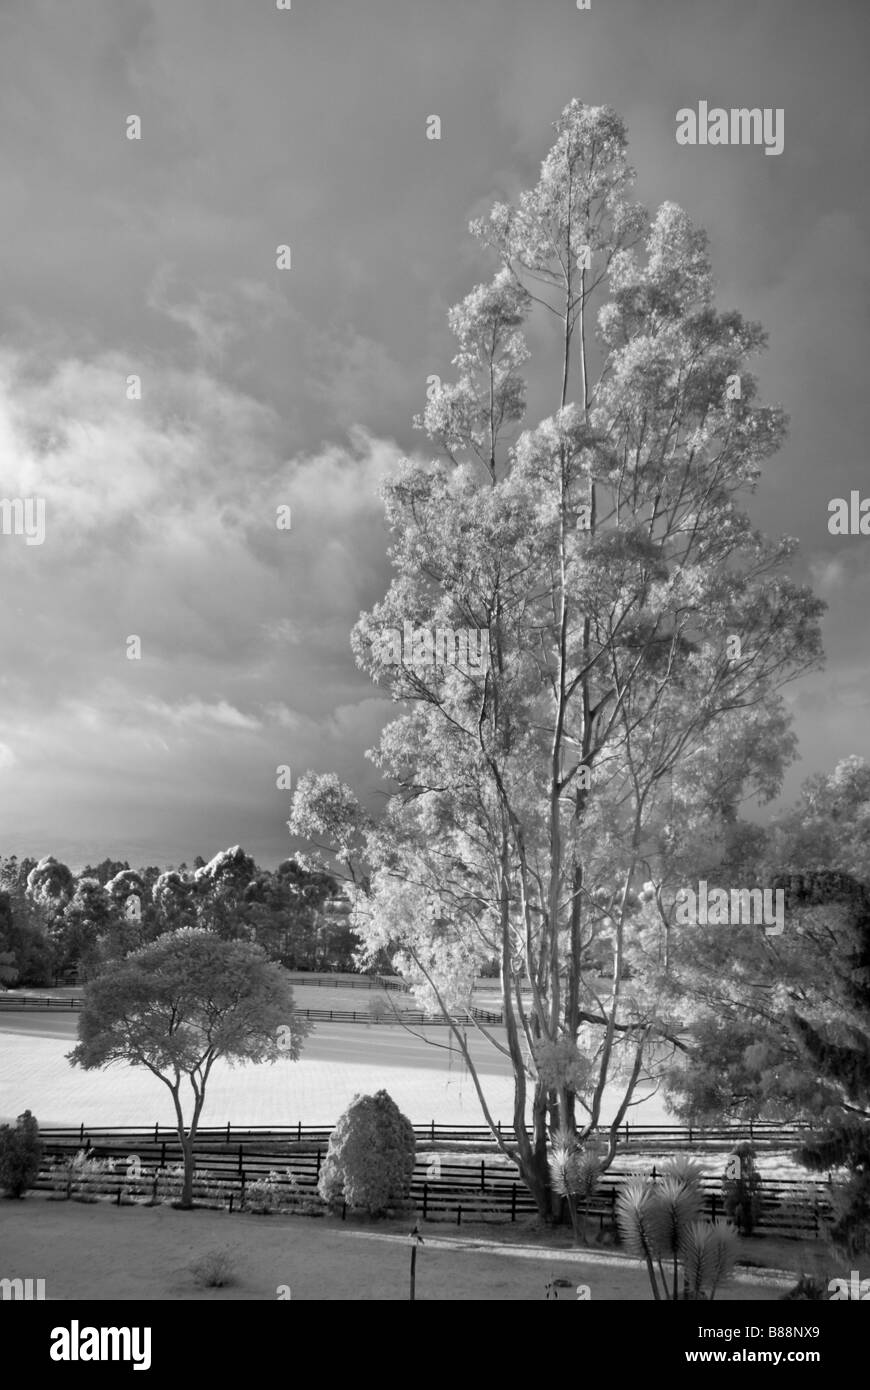 Árbol de eucalipto y campos de polo de la Sabana, cerca de Bogotá, Colombia Imagen De Stock